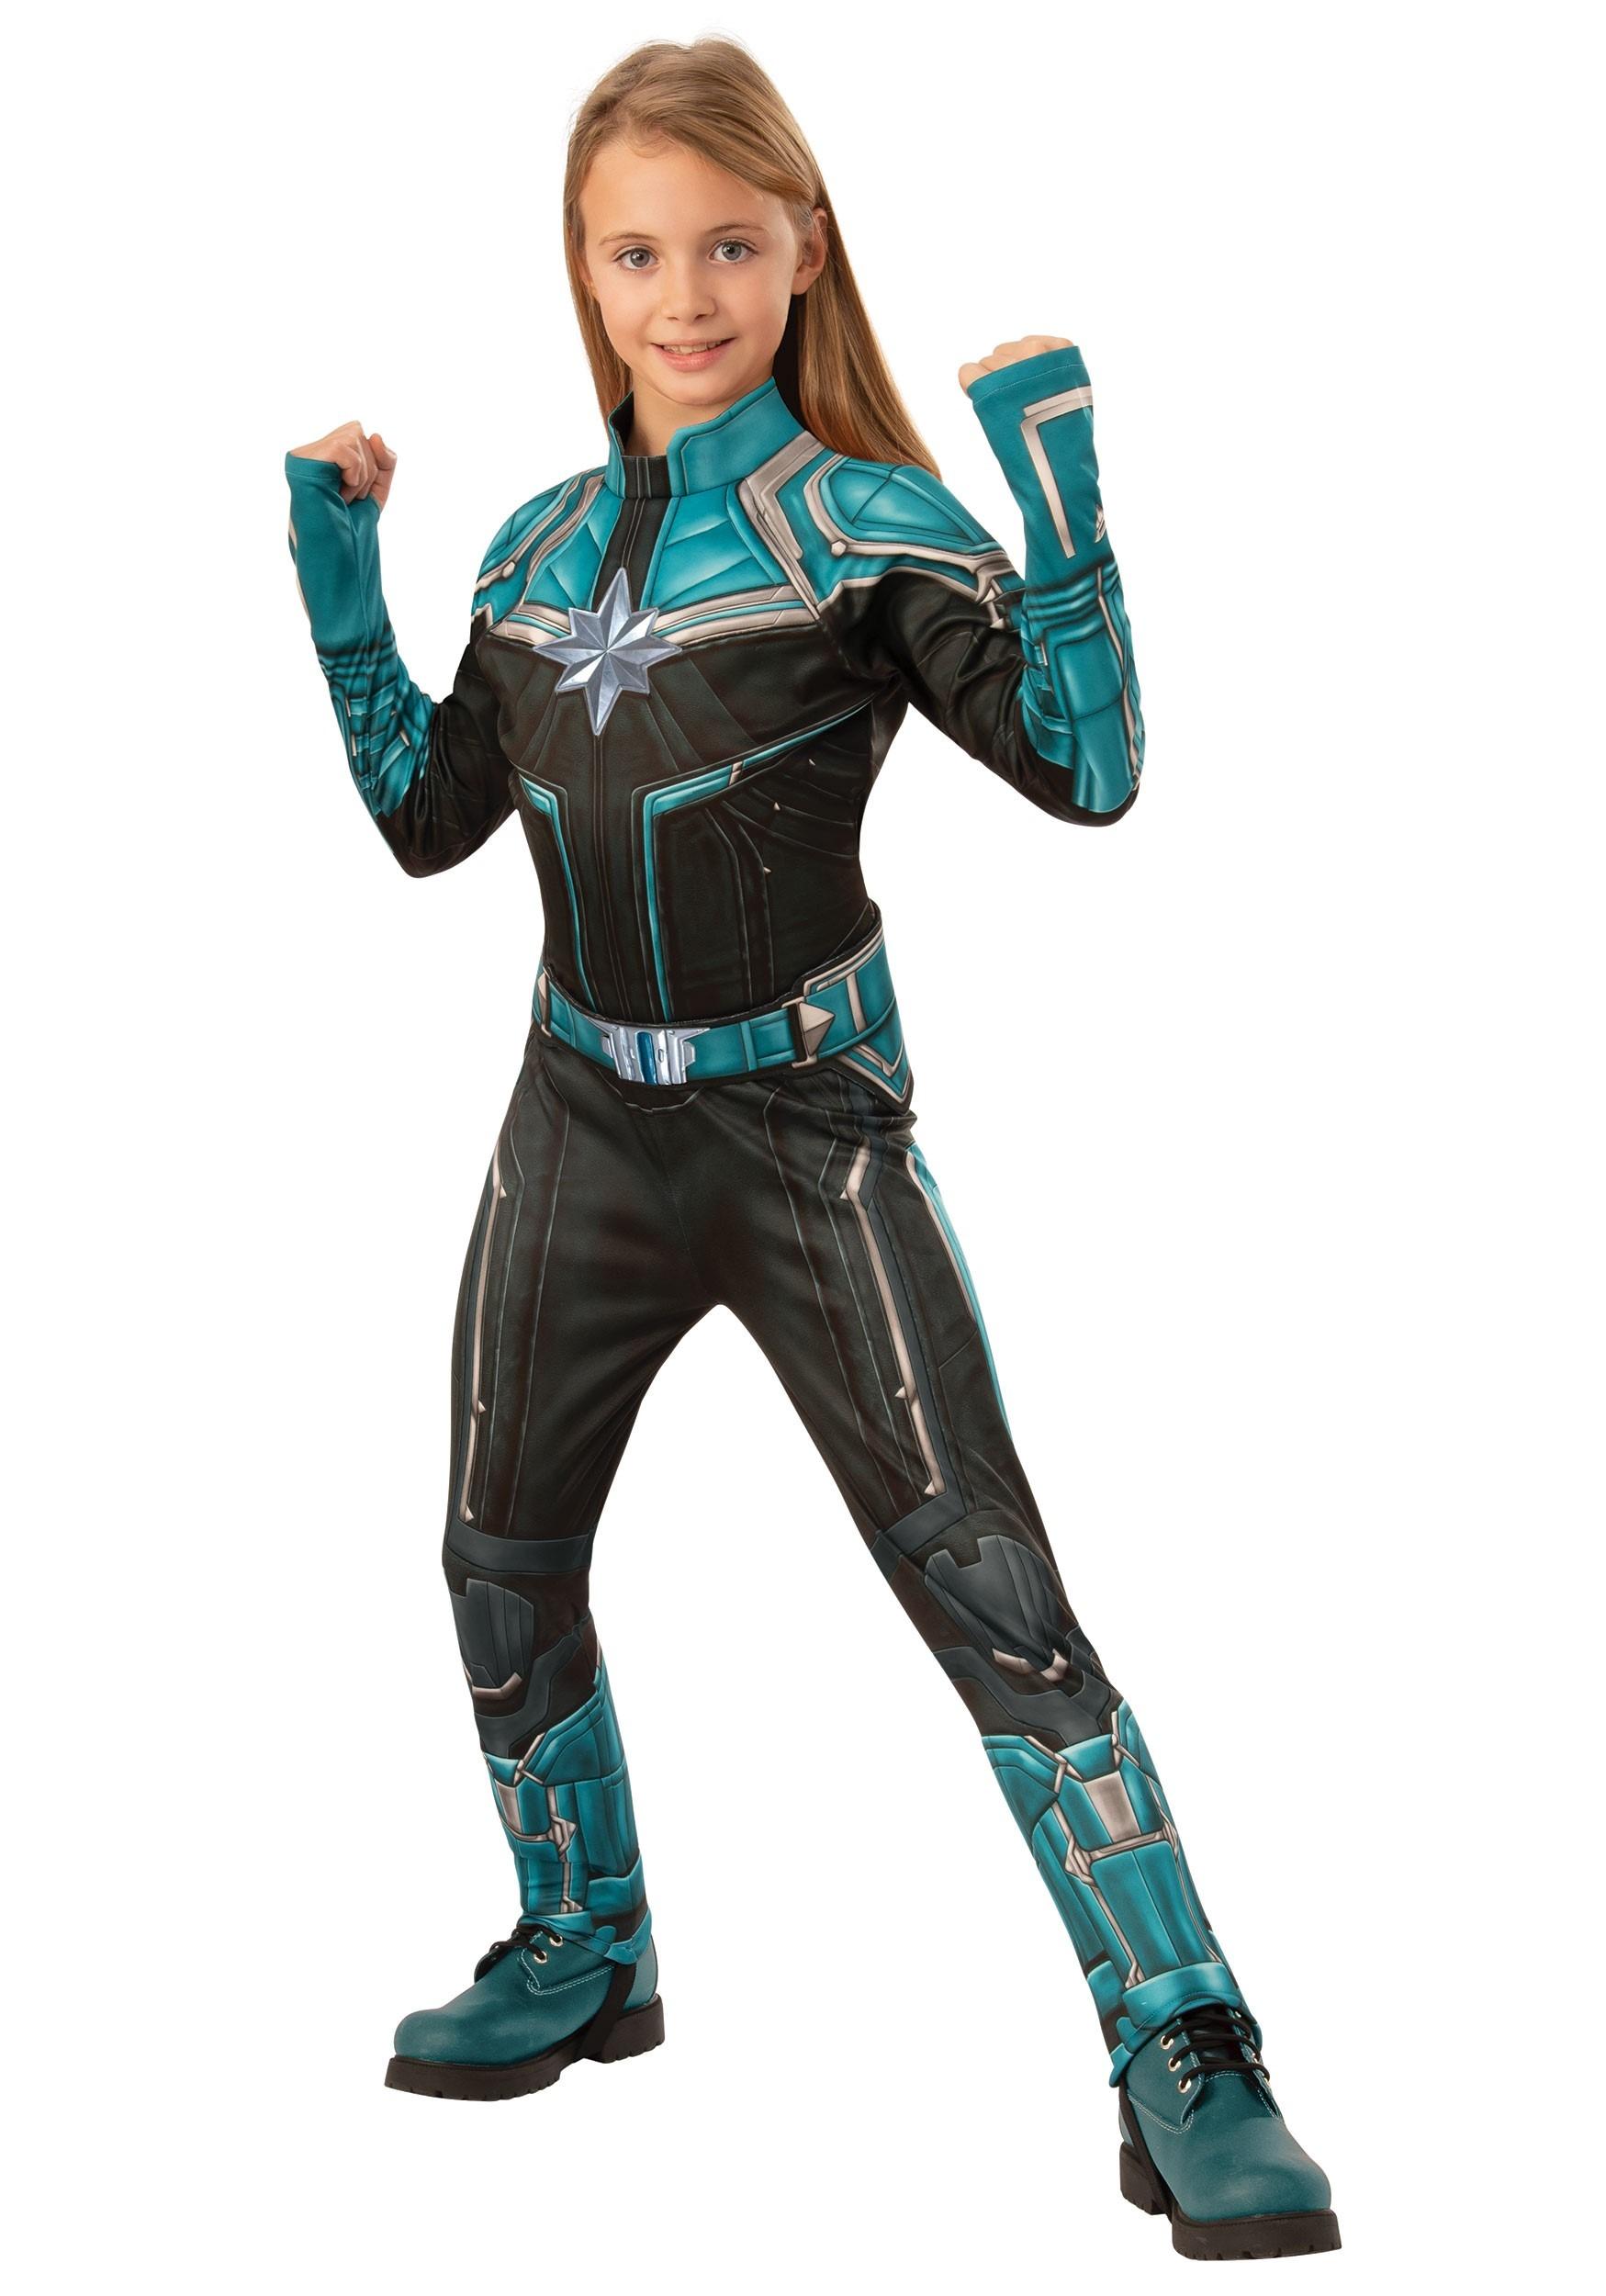 Kids Deluxe Captain Marvel Kree Suit Costume